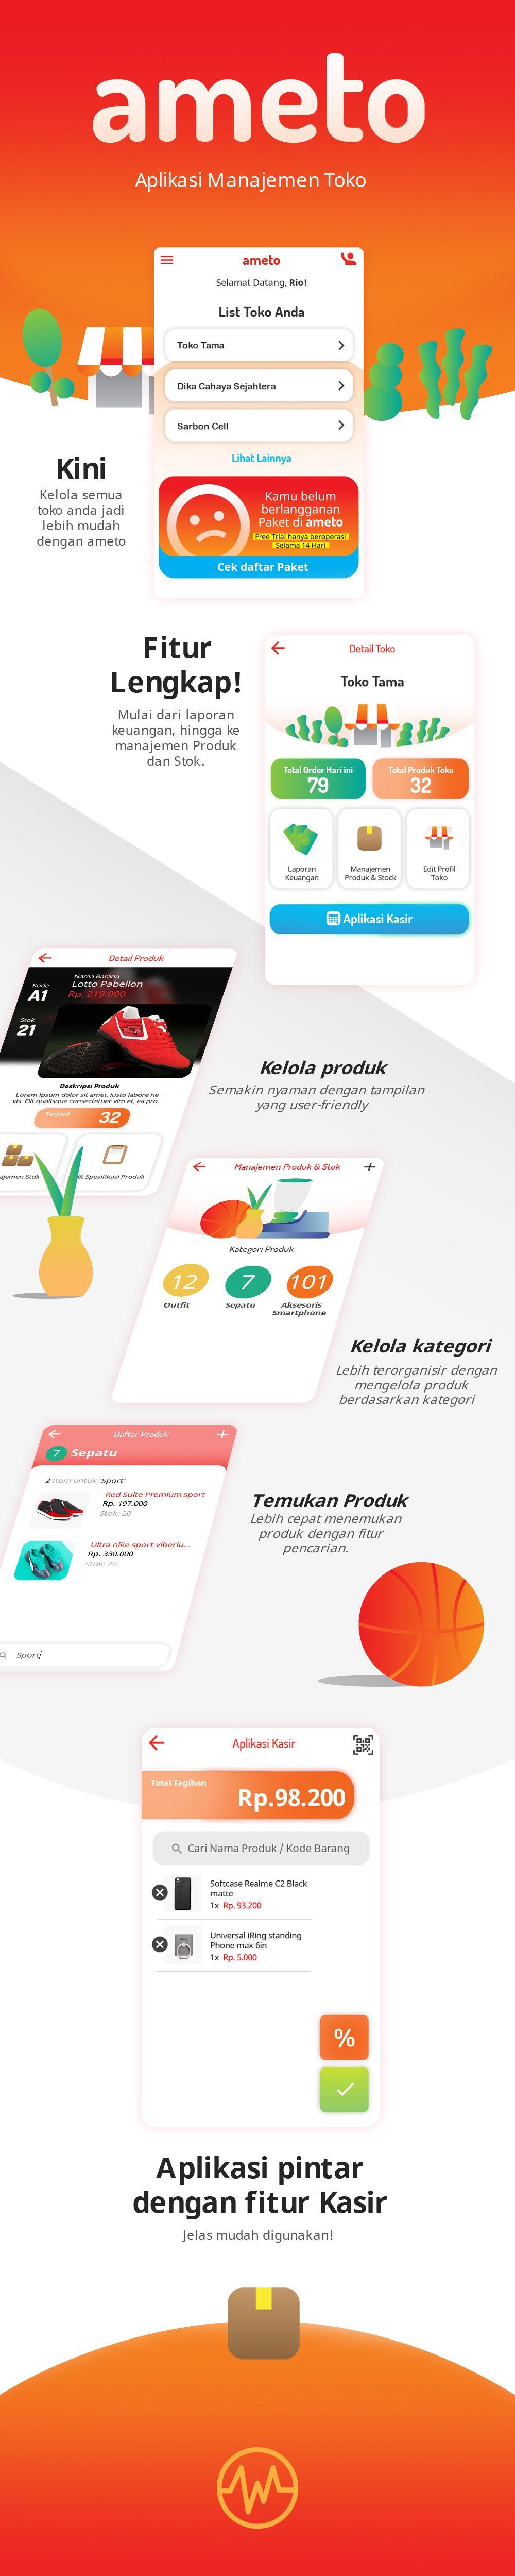 Mobile App Design Ameto Manager App Aplikasi Produk Laporan Keuangan